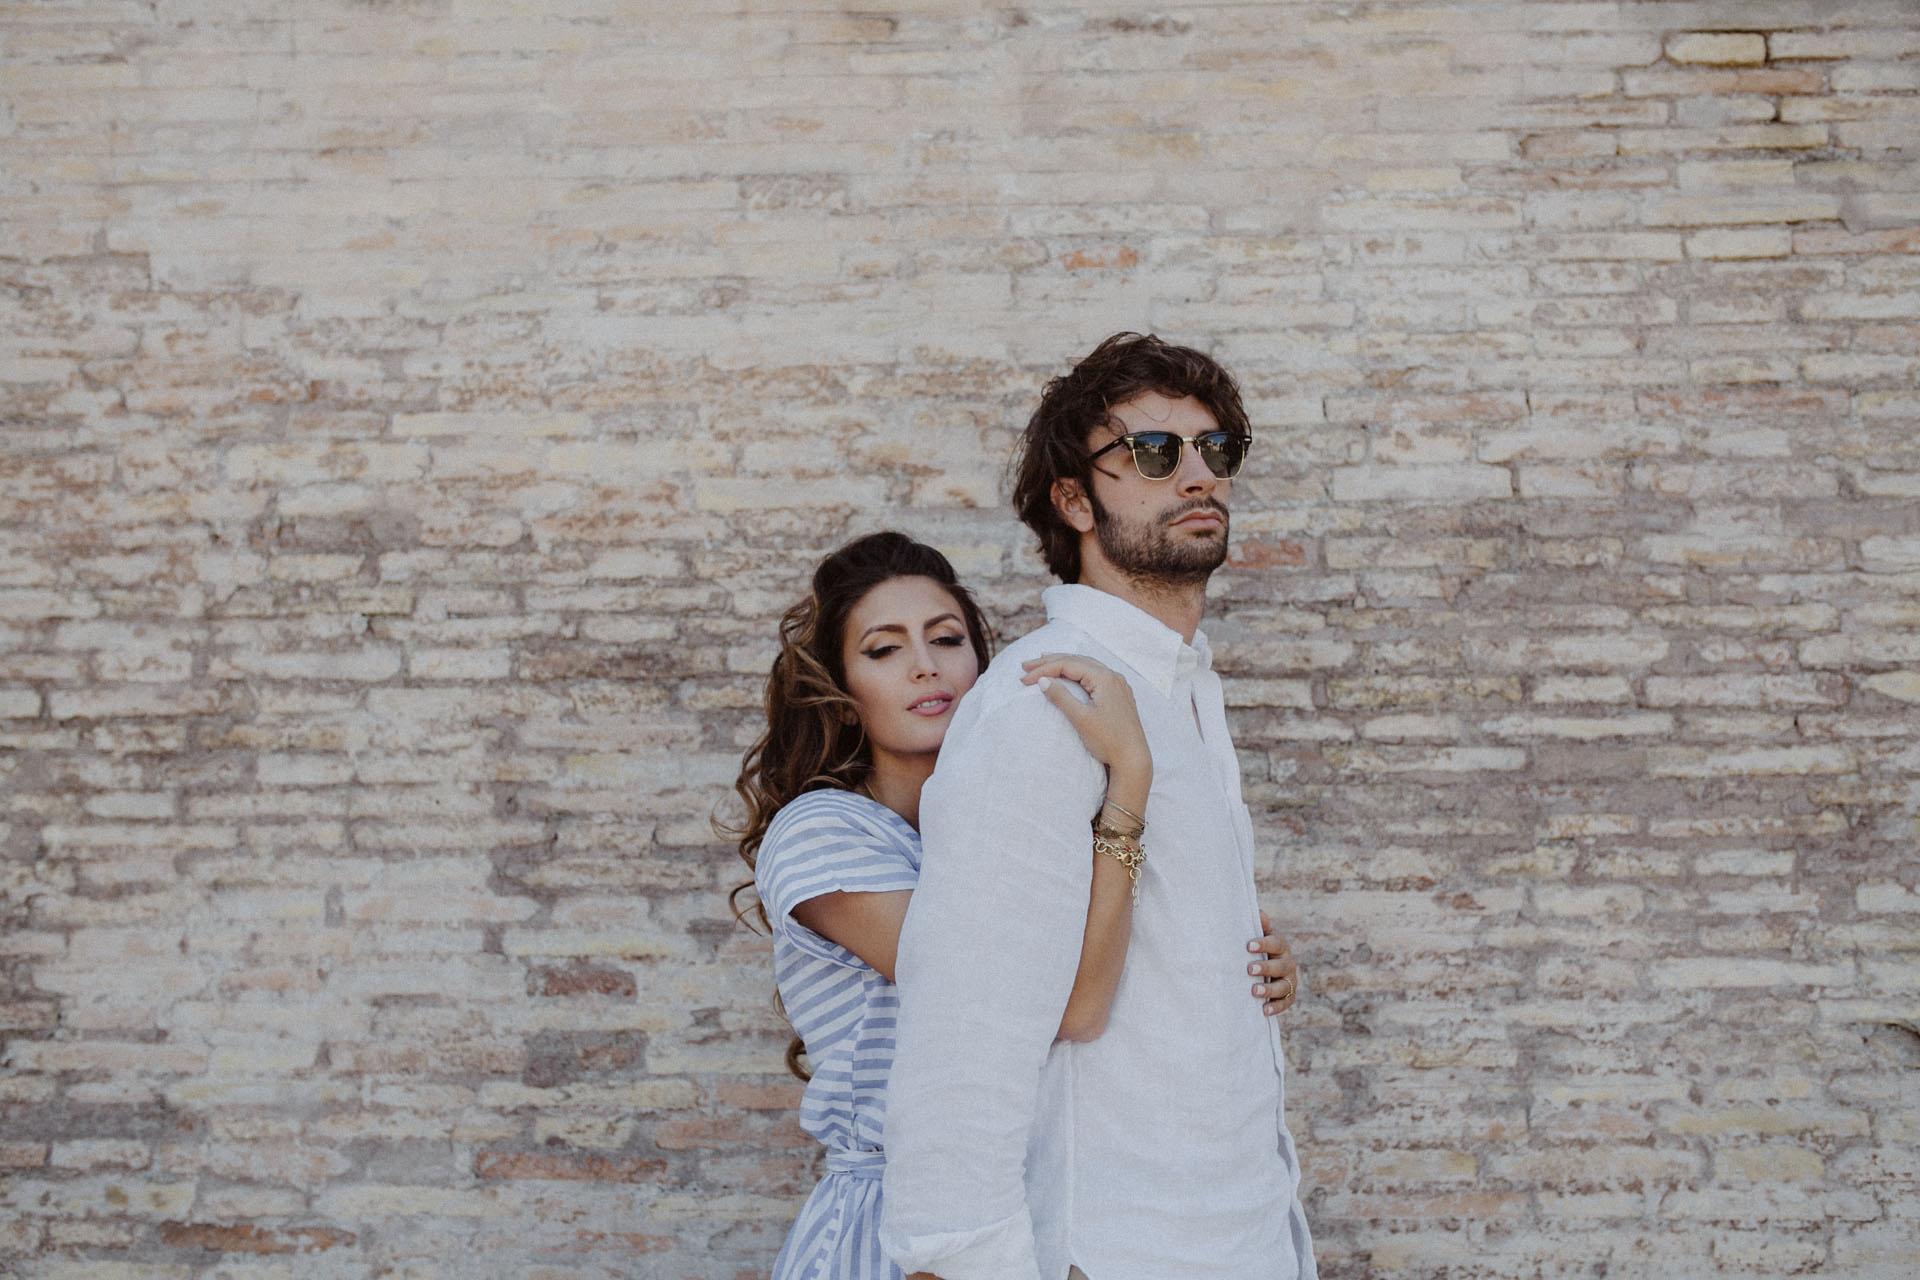 coupleshooting-roma-hochzeitsfotografen-wien-agnesundandi-34